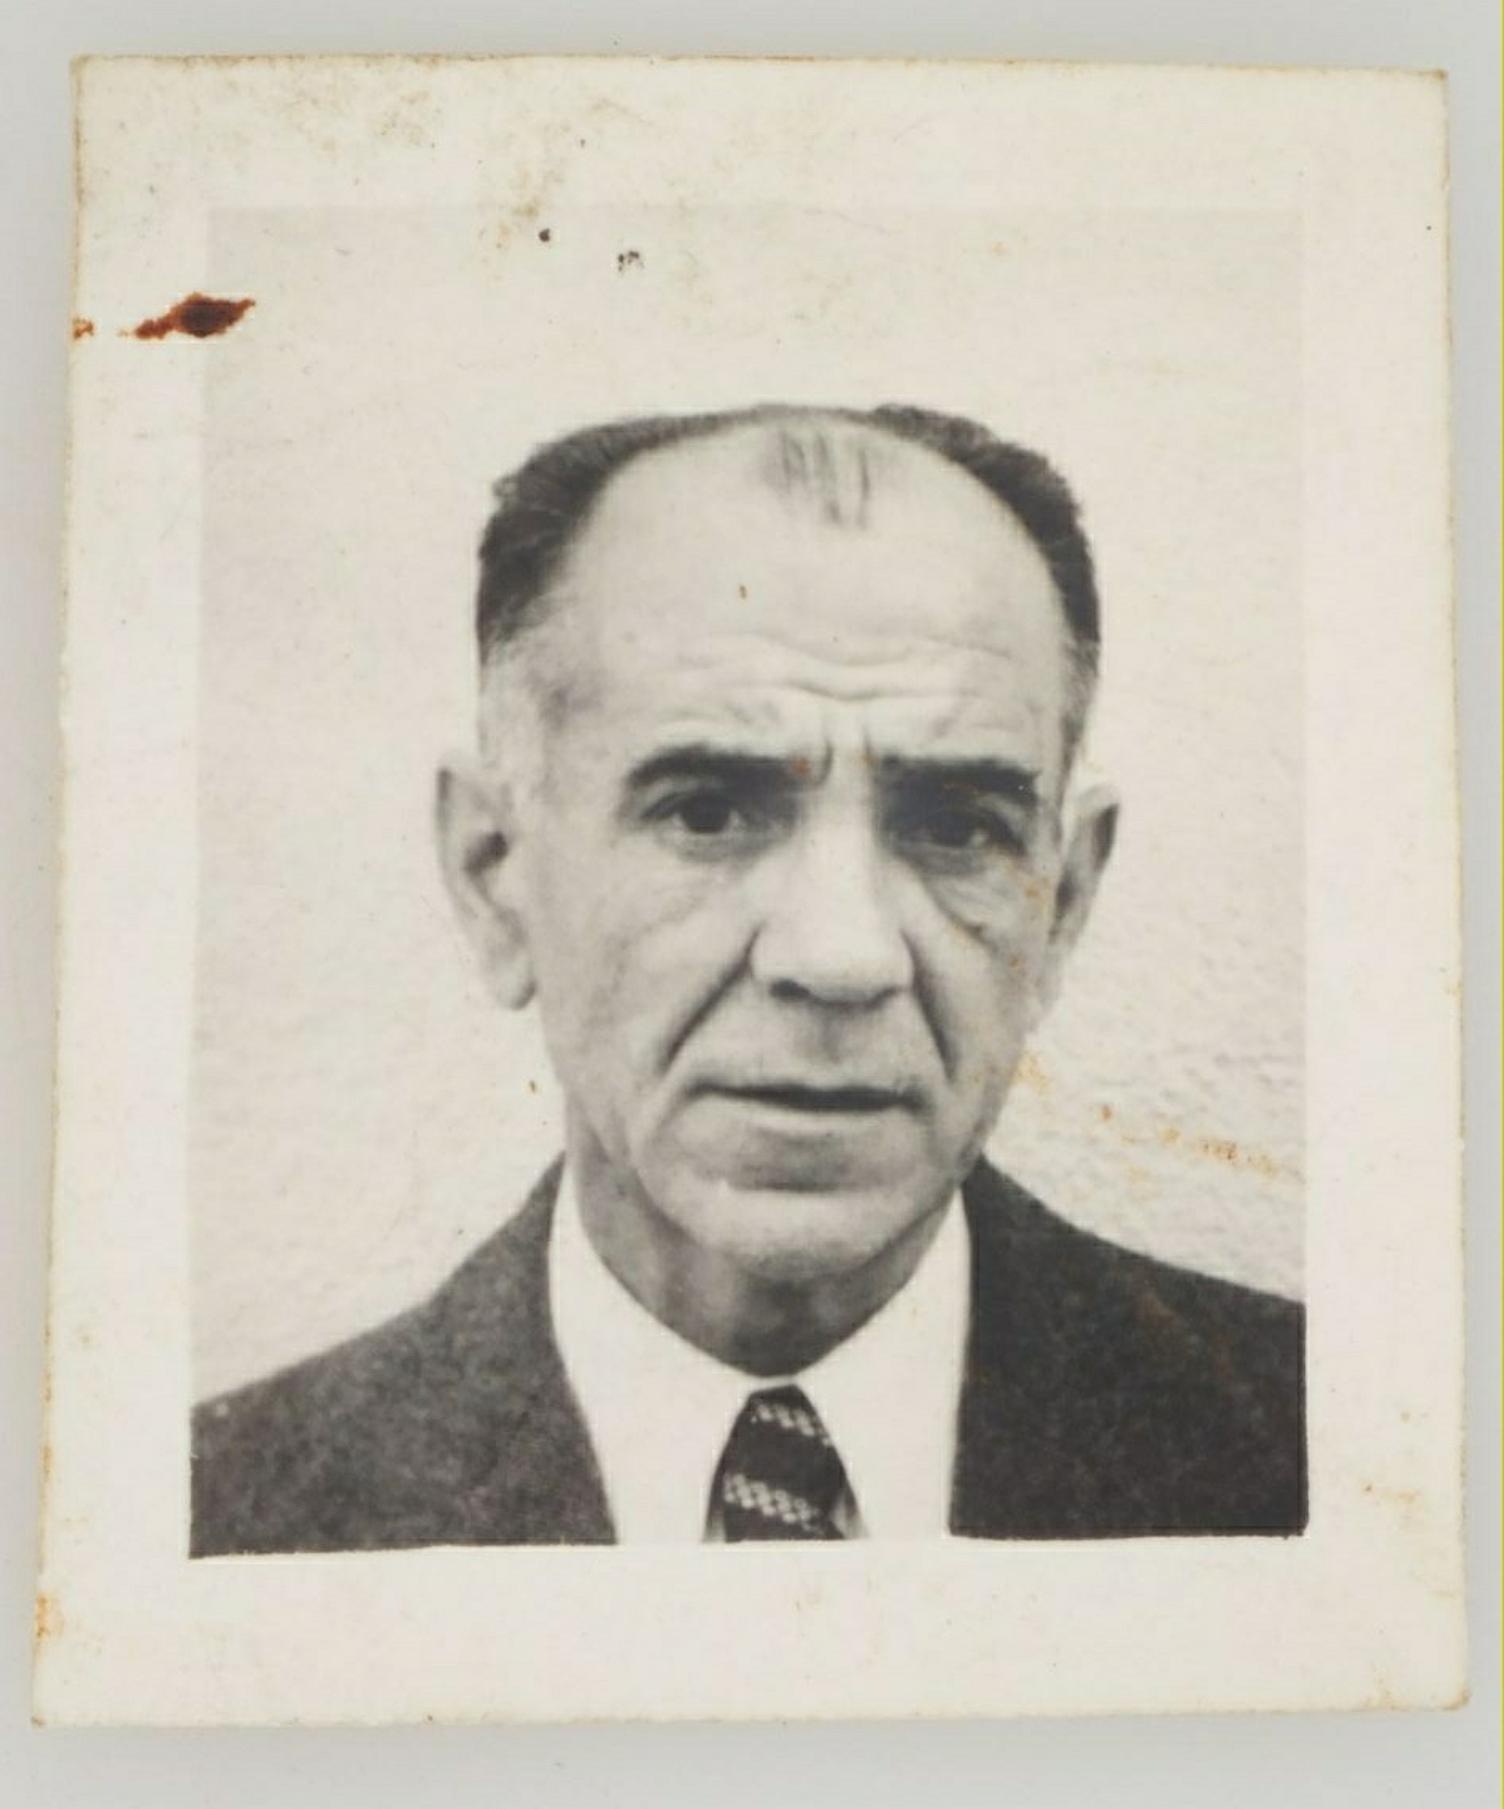 Vicente Borjhabad Alguacil